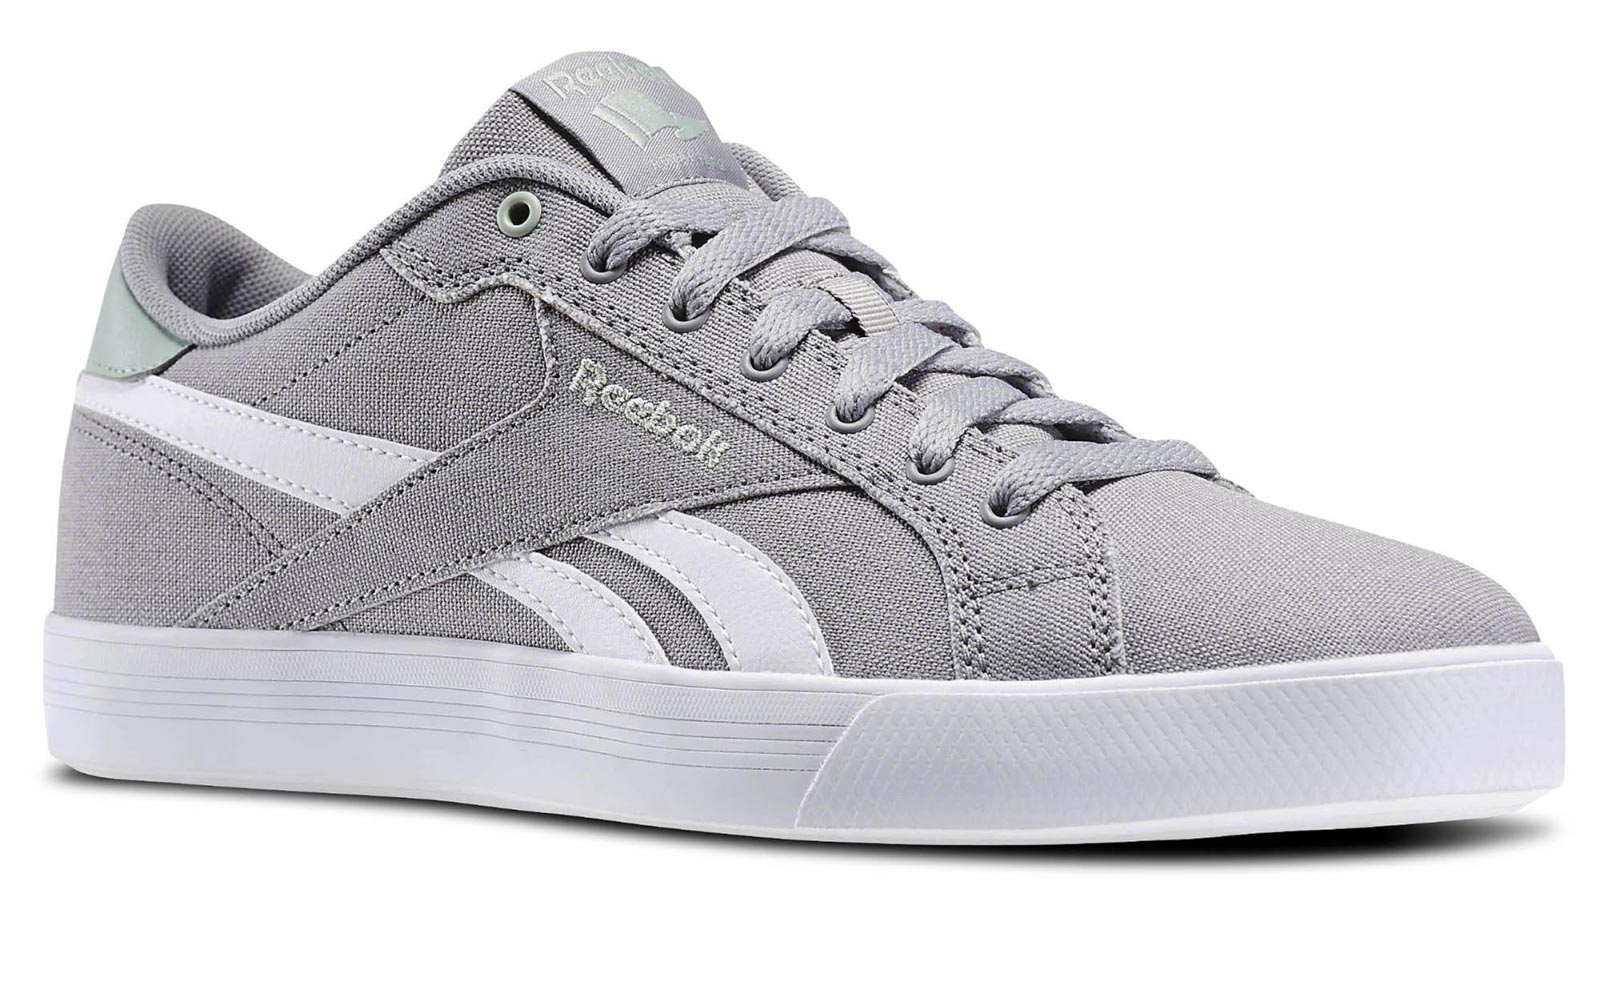 Reebok ROYAL COMPLETE LCN. Men's leisure shoes